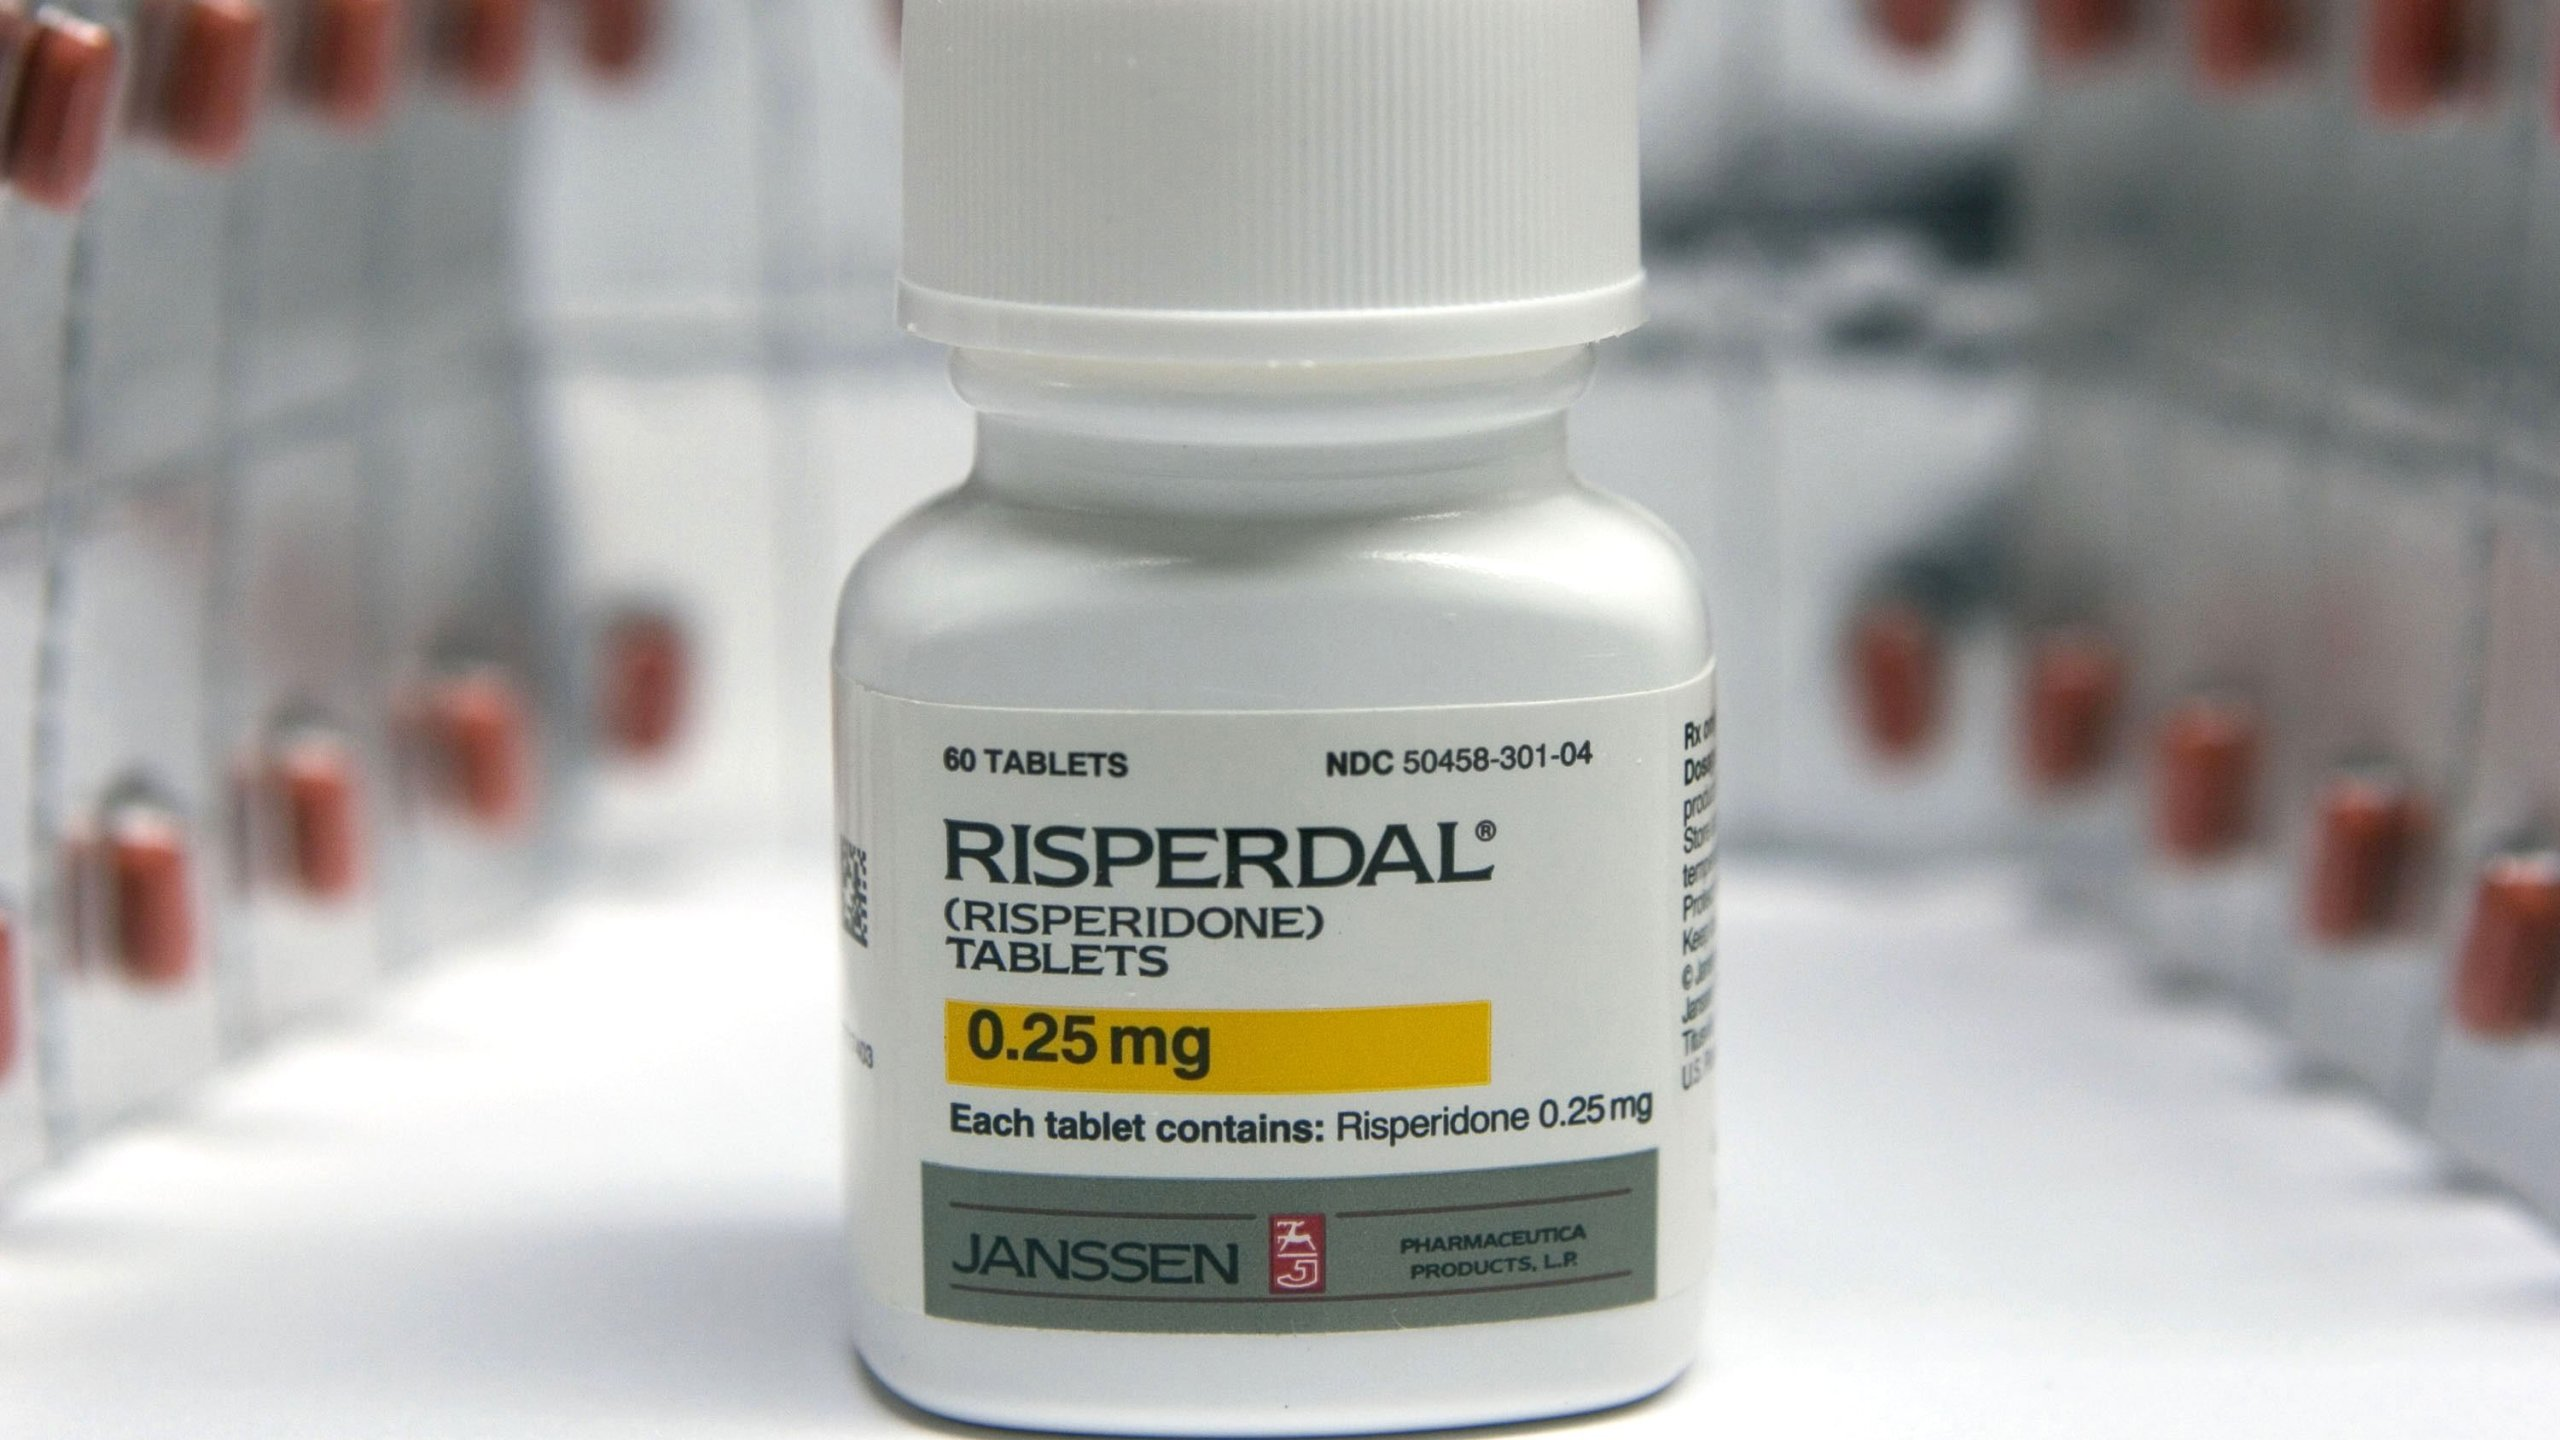 Johnson & Johnson's drug Risperdal is seen in an undated photo. (Credit: JB Reed/Bloomberg via Getty)